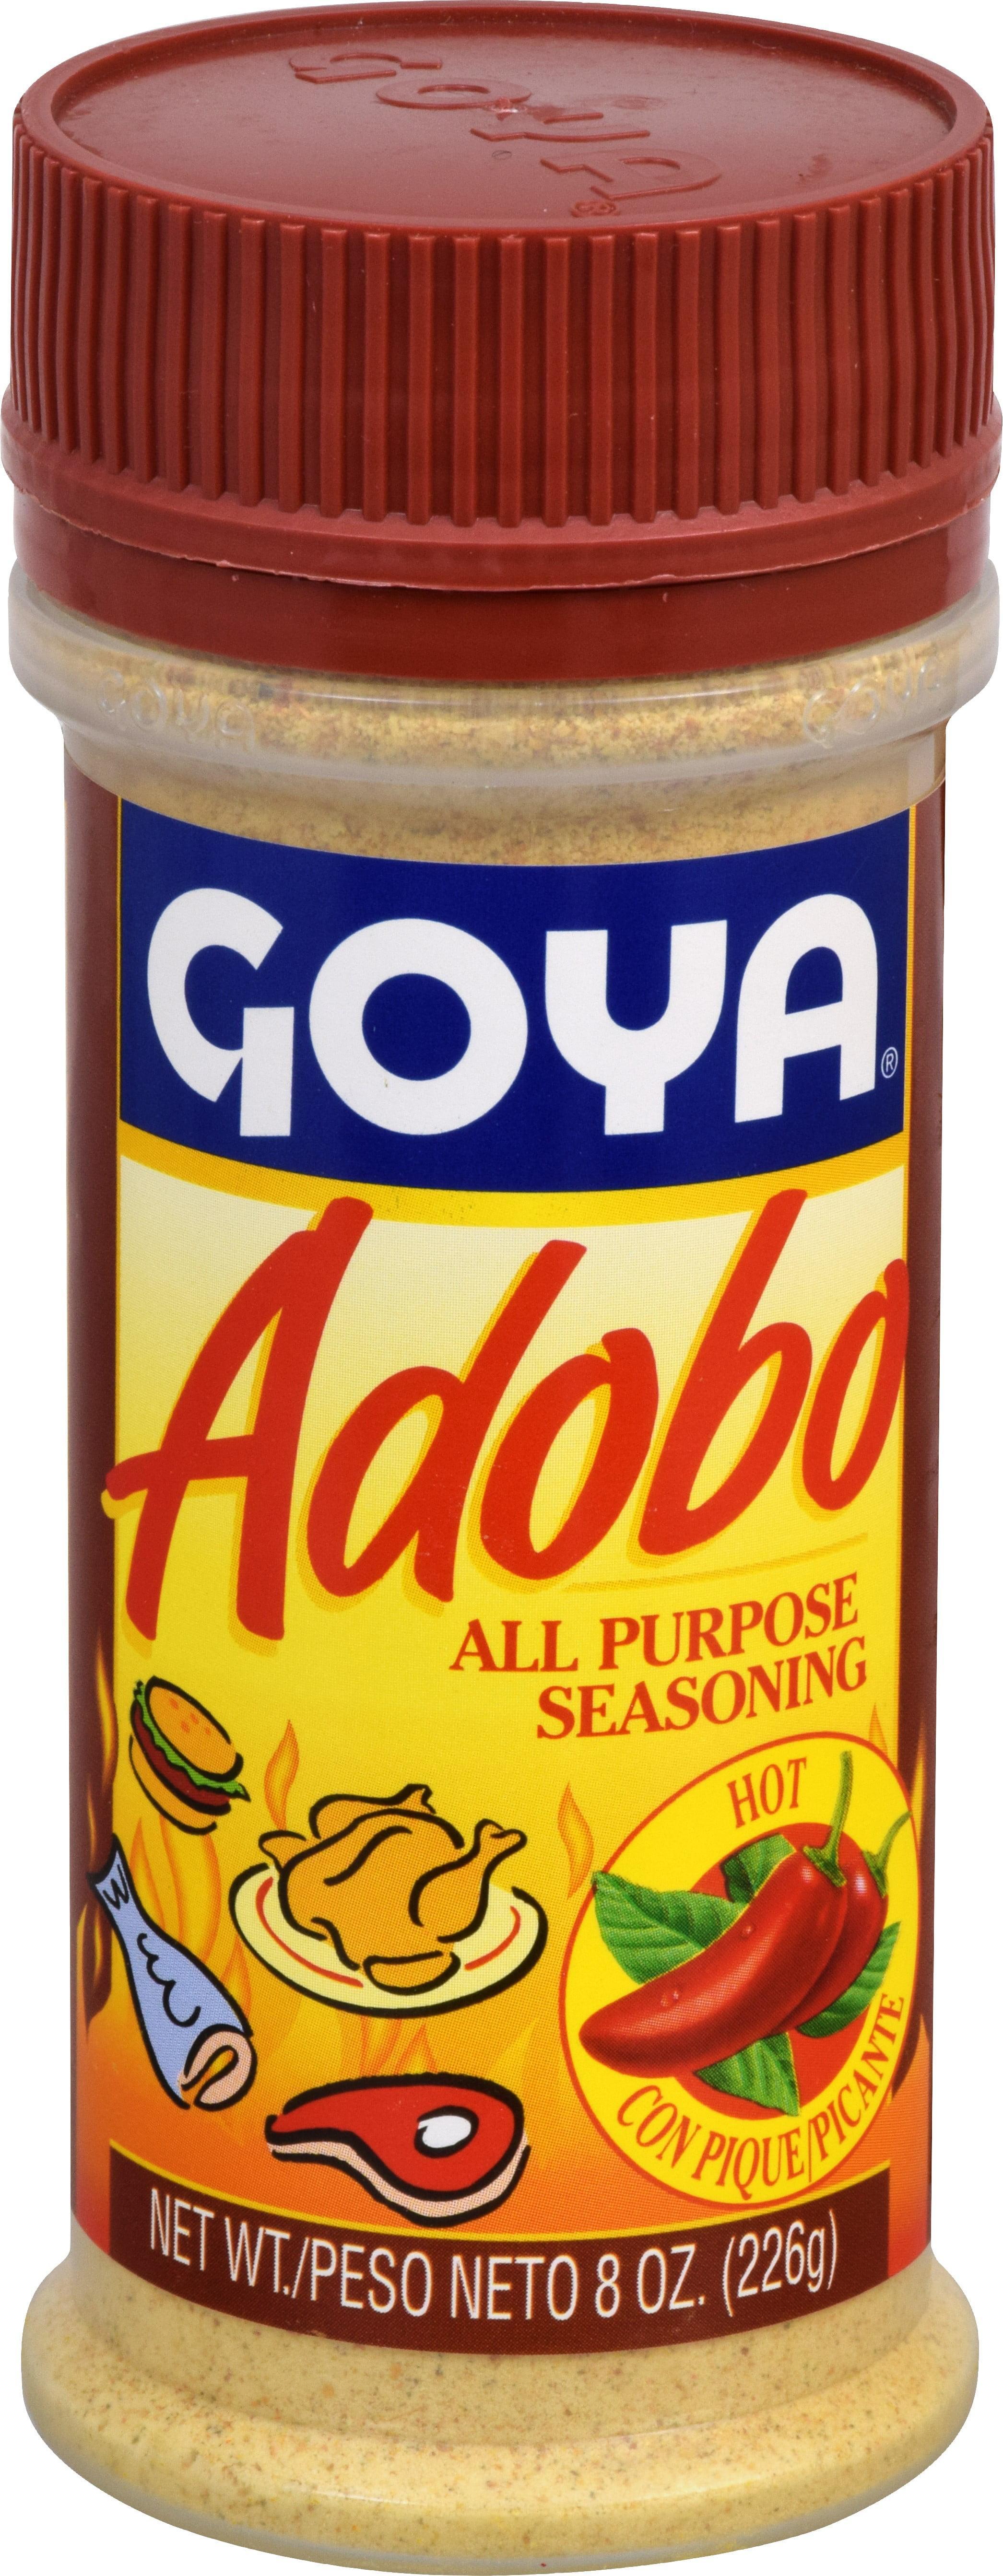 Goya Adobo All Purpose Seasoning, Hot, 8 Oz by Goya Foods